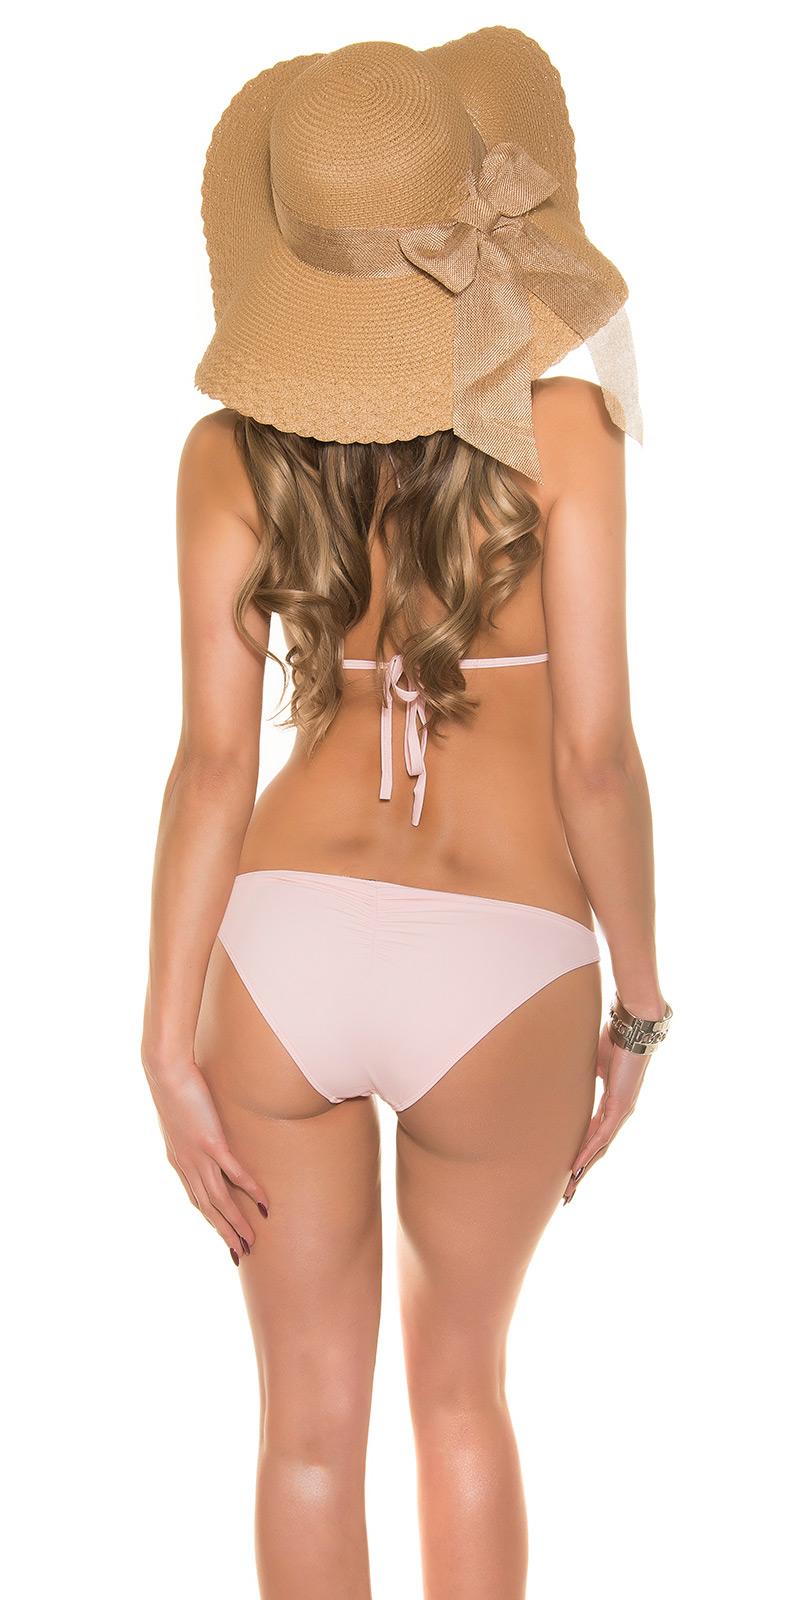 Cuello de cisne push-up bikini Triangle pedrería Brazil Beachwear tankini traje de baño